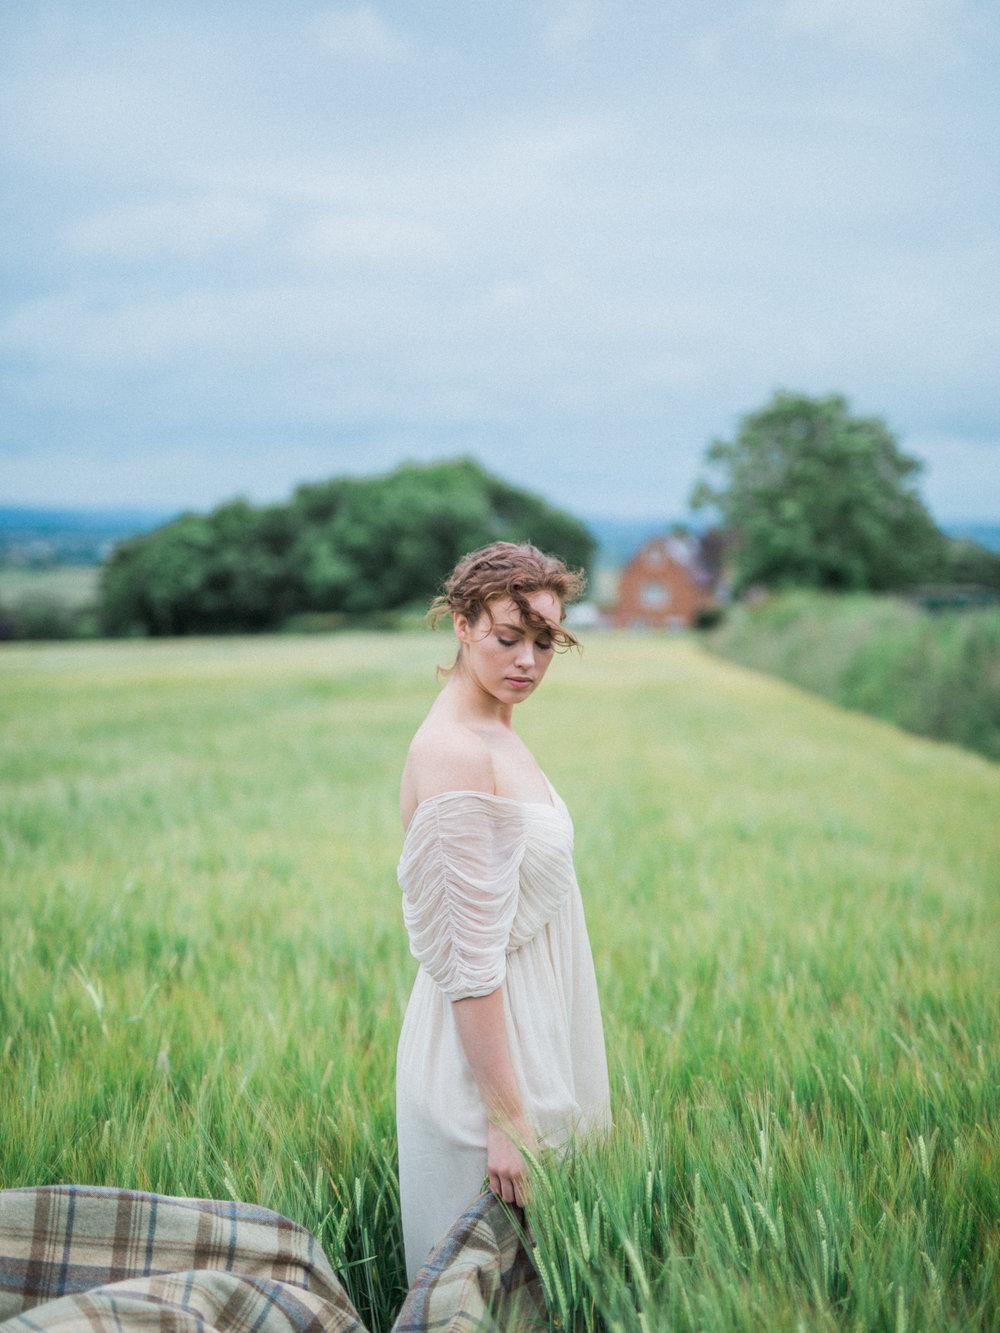 DanielleGirouxPhotography_EuropeTrip0C6A8968.jpg